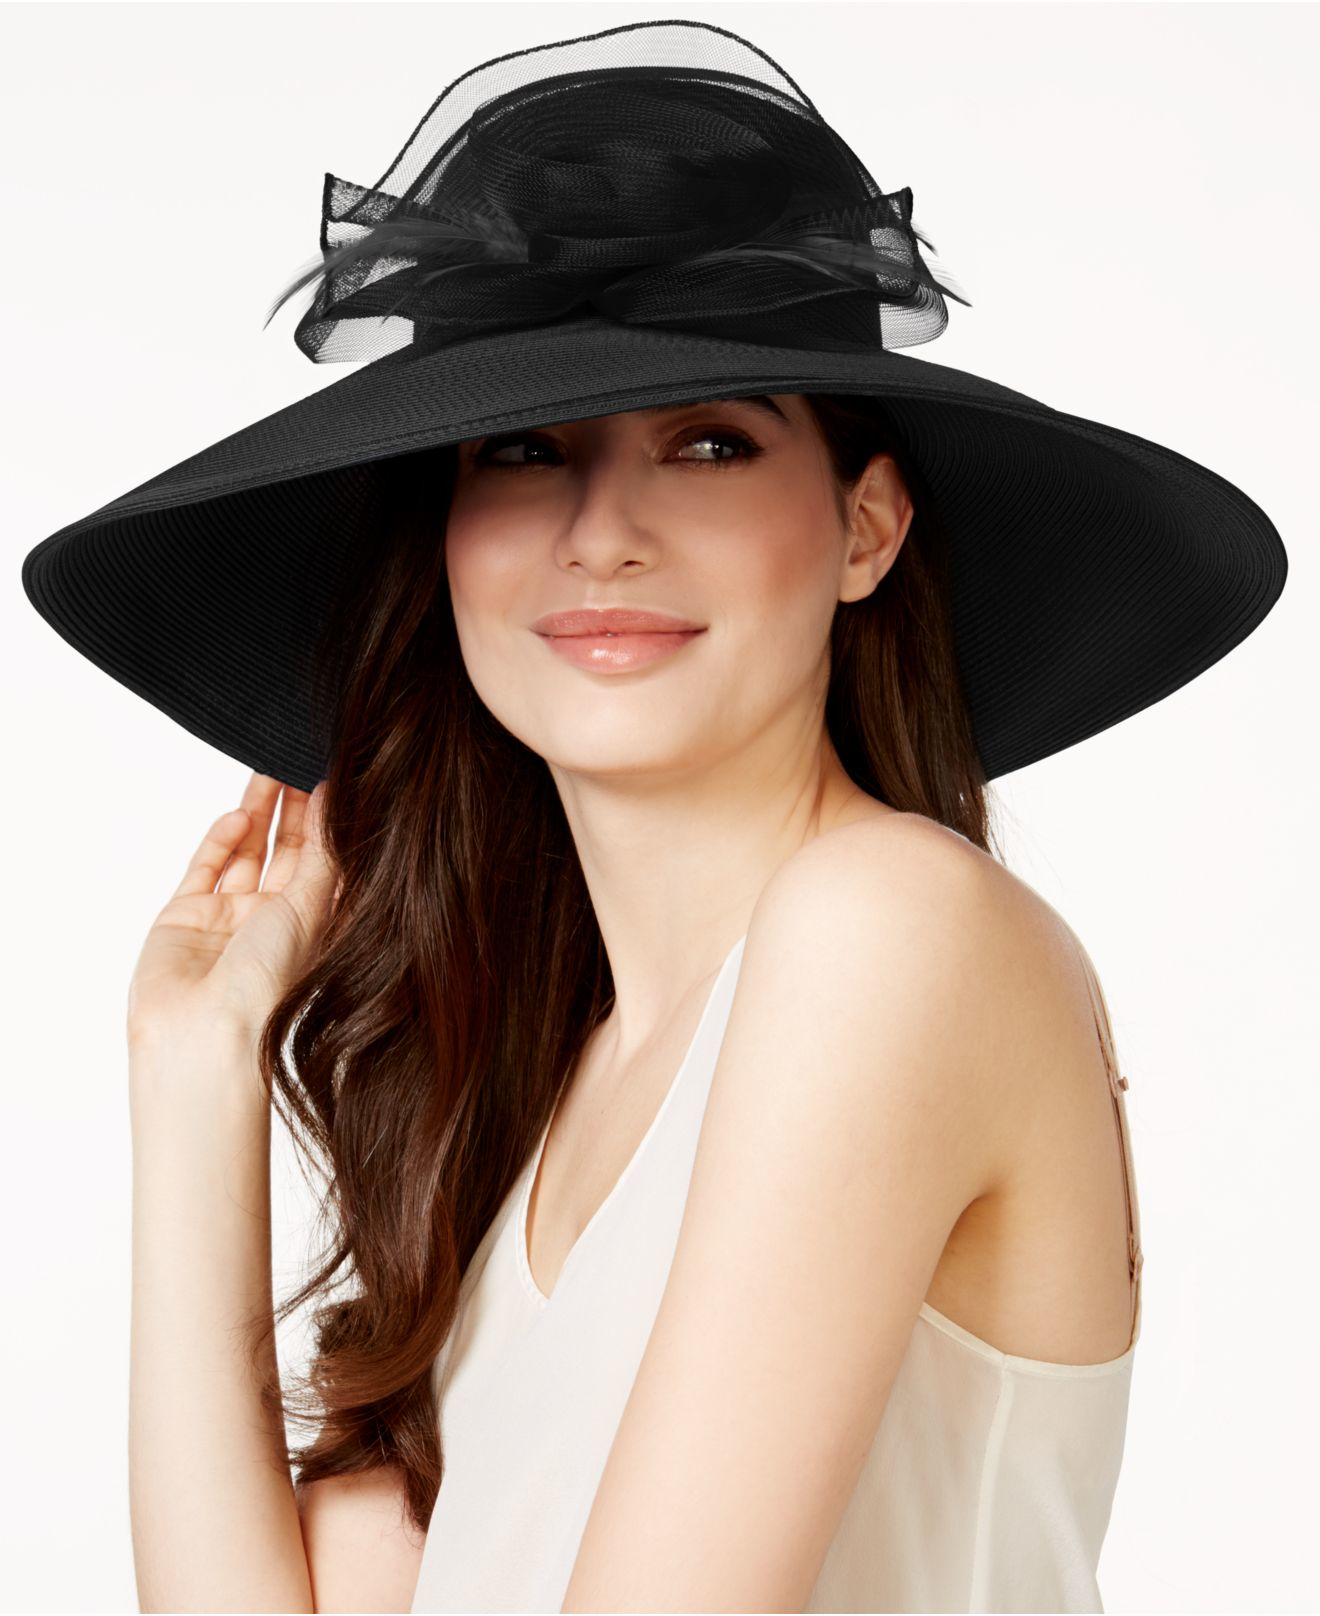 Womens Black Dress Hats - Hat HD Image Ukjugs.Org 5d0ca4bf348